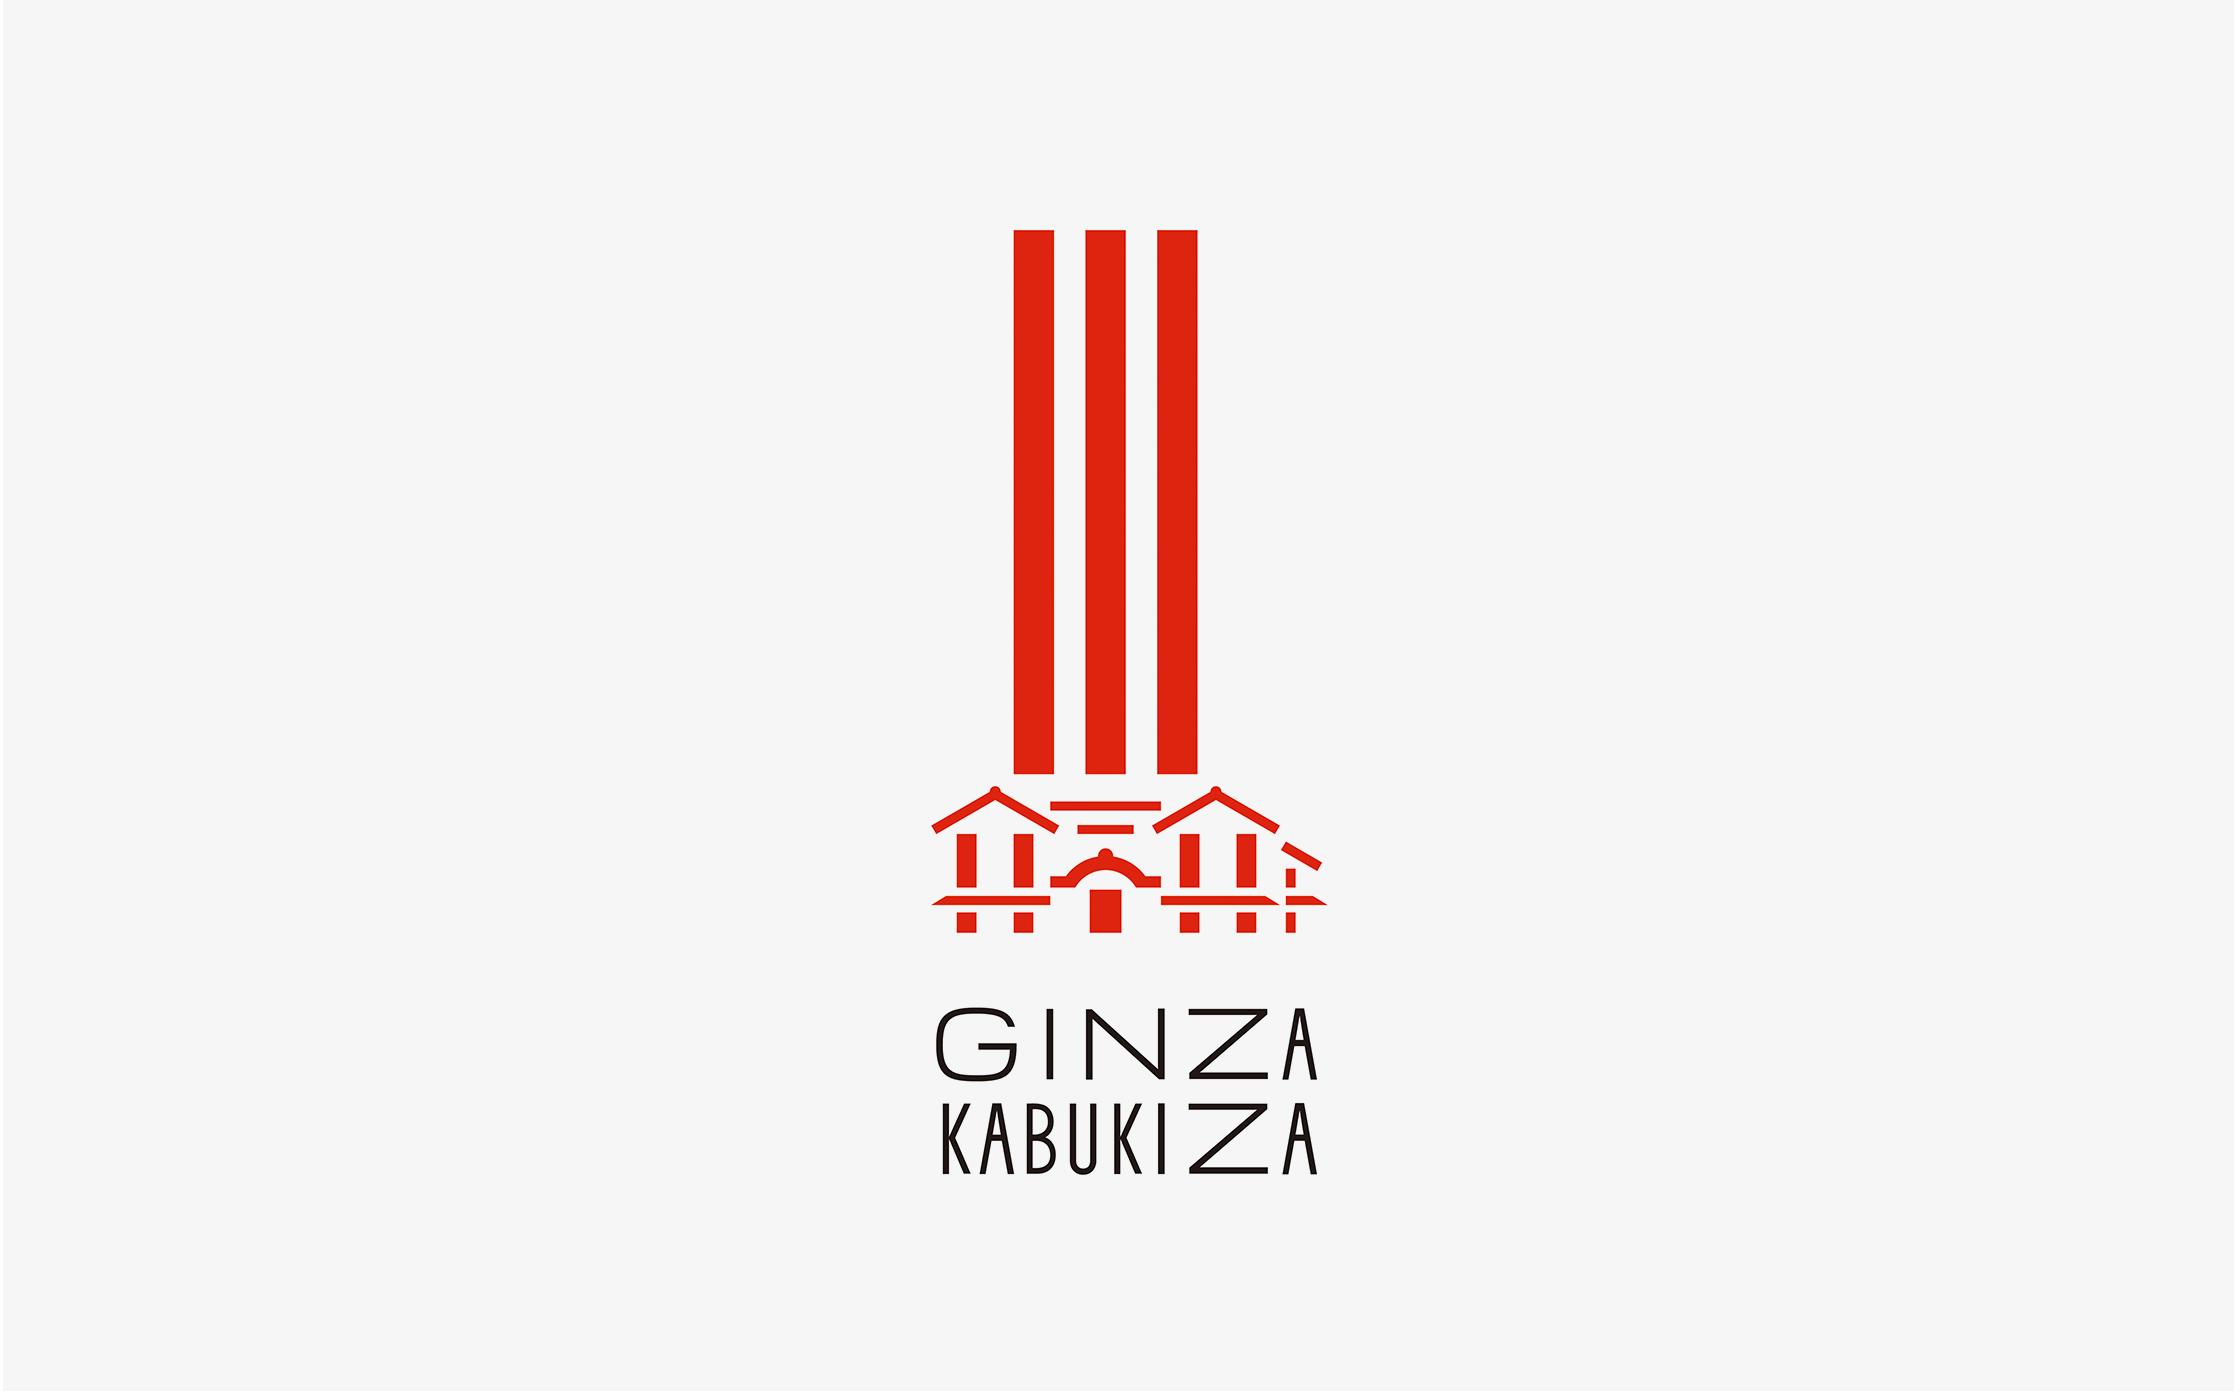 GINZA KABUKIZA